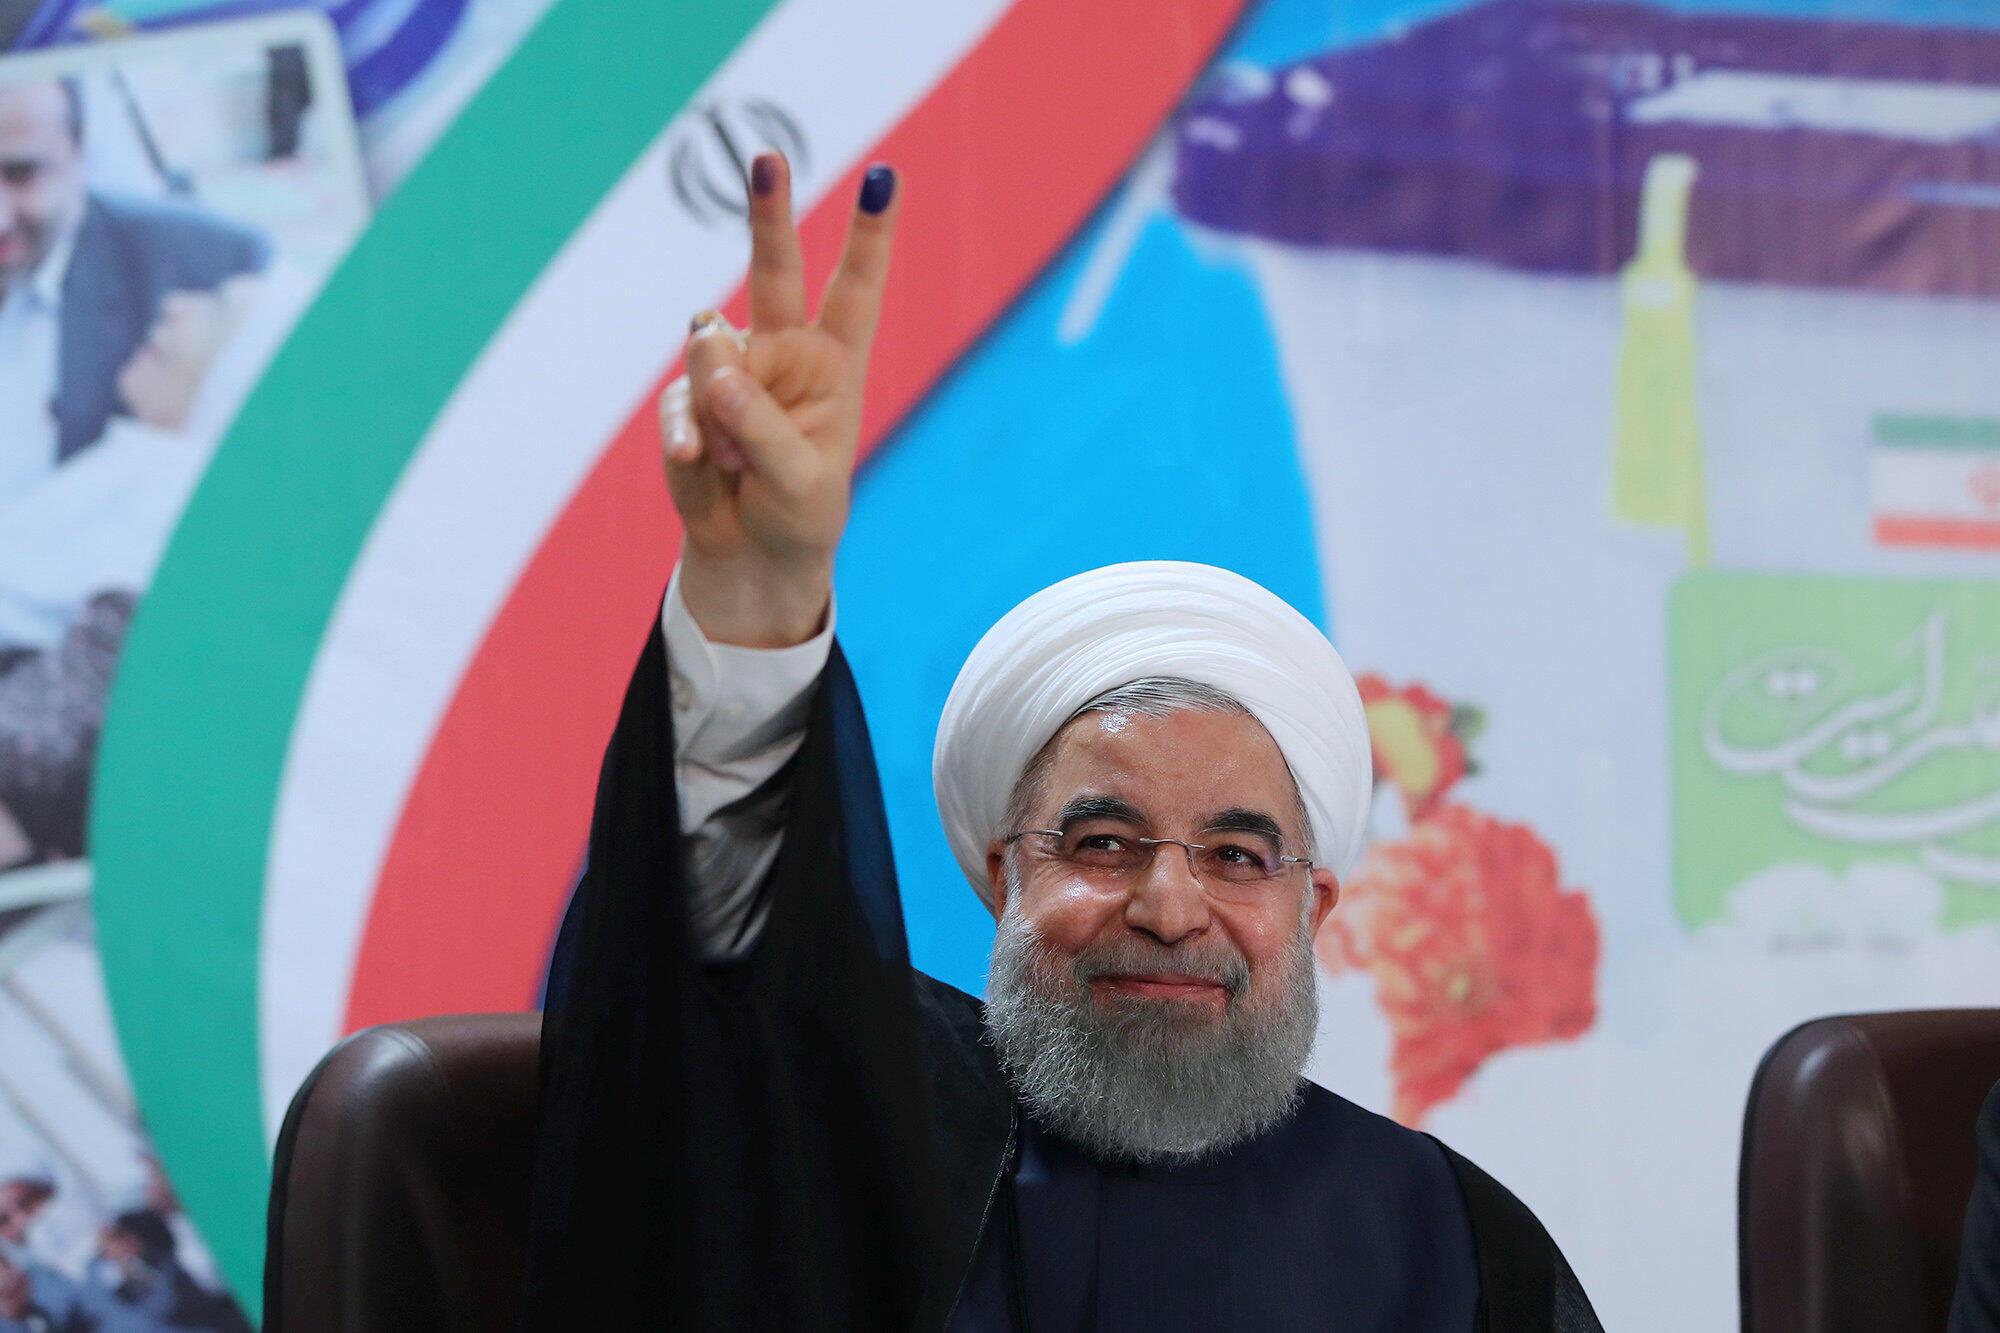 O atual presidente iraniano, Hassan Rohani